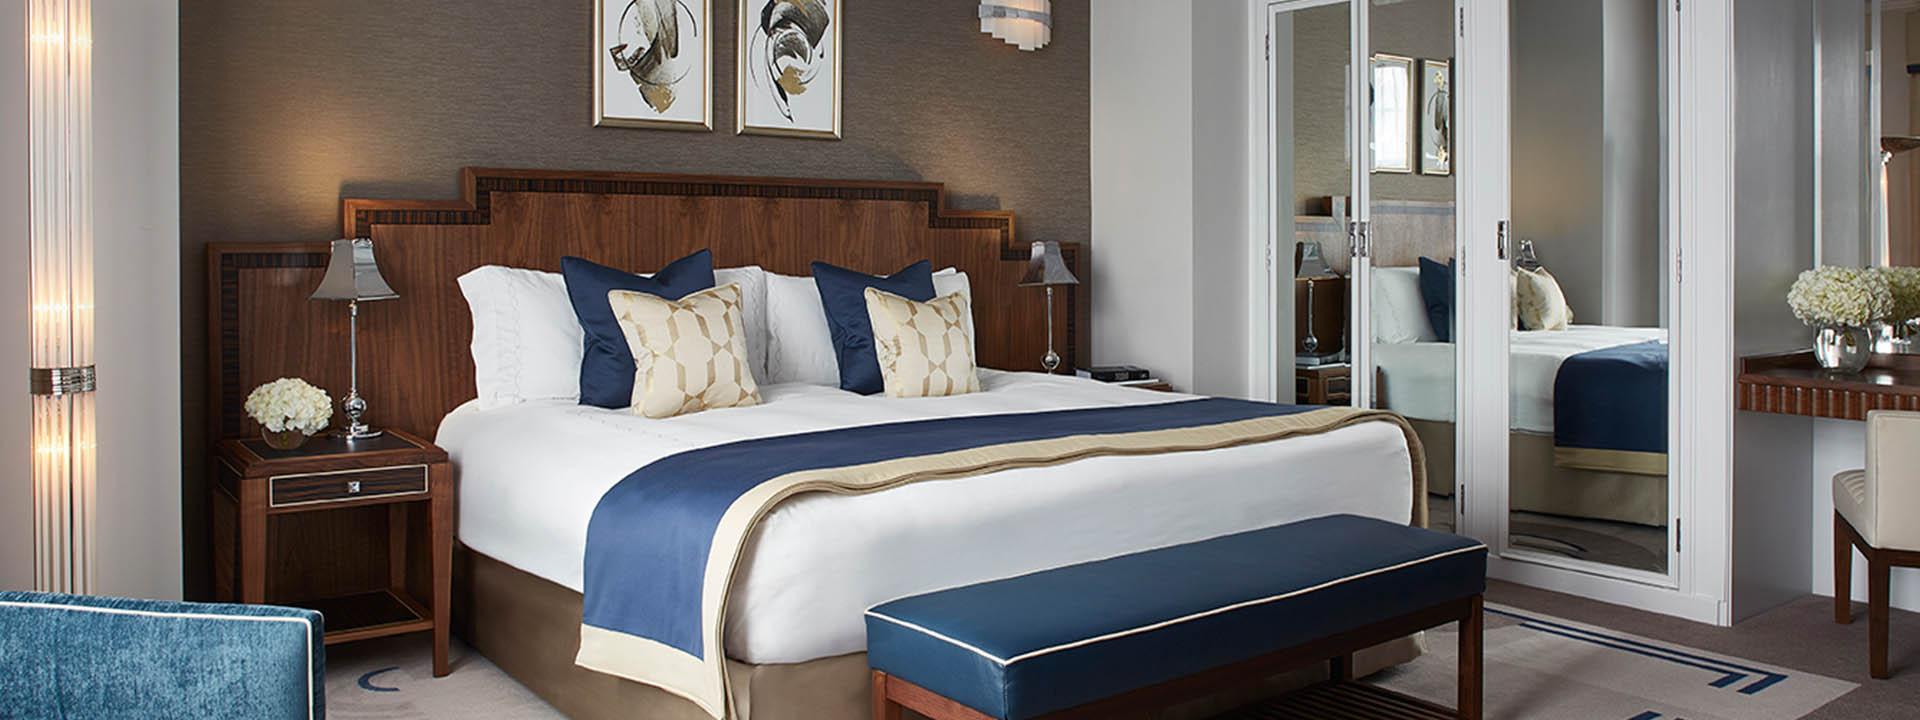 Mayfair Suite Bedroom